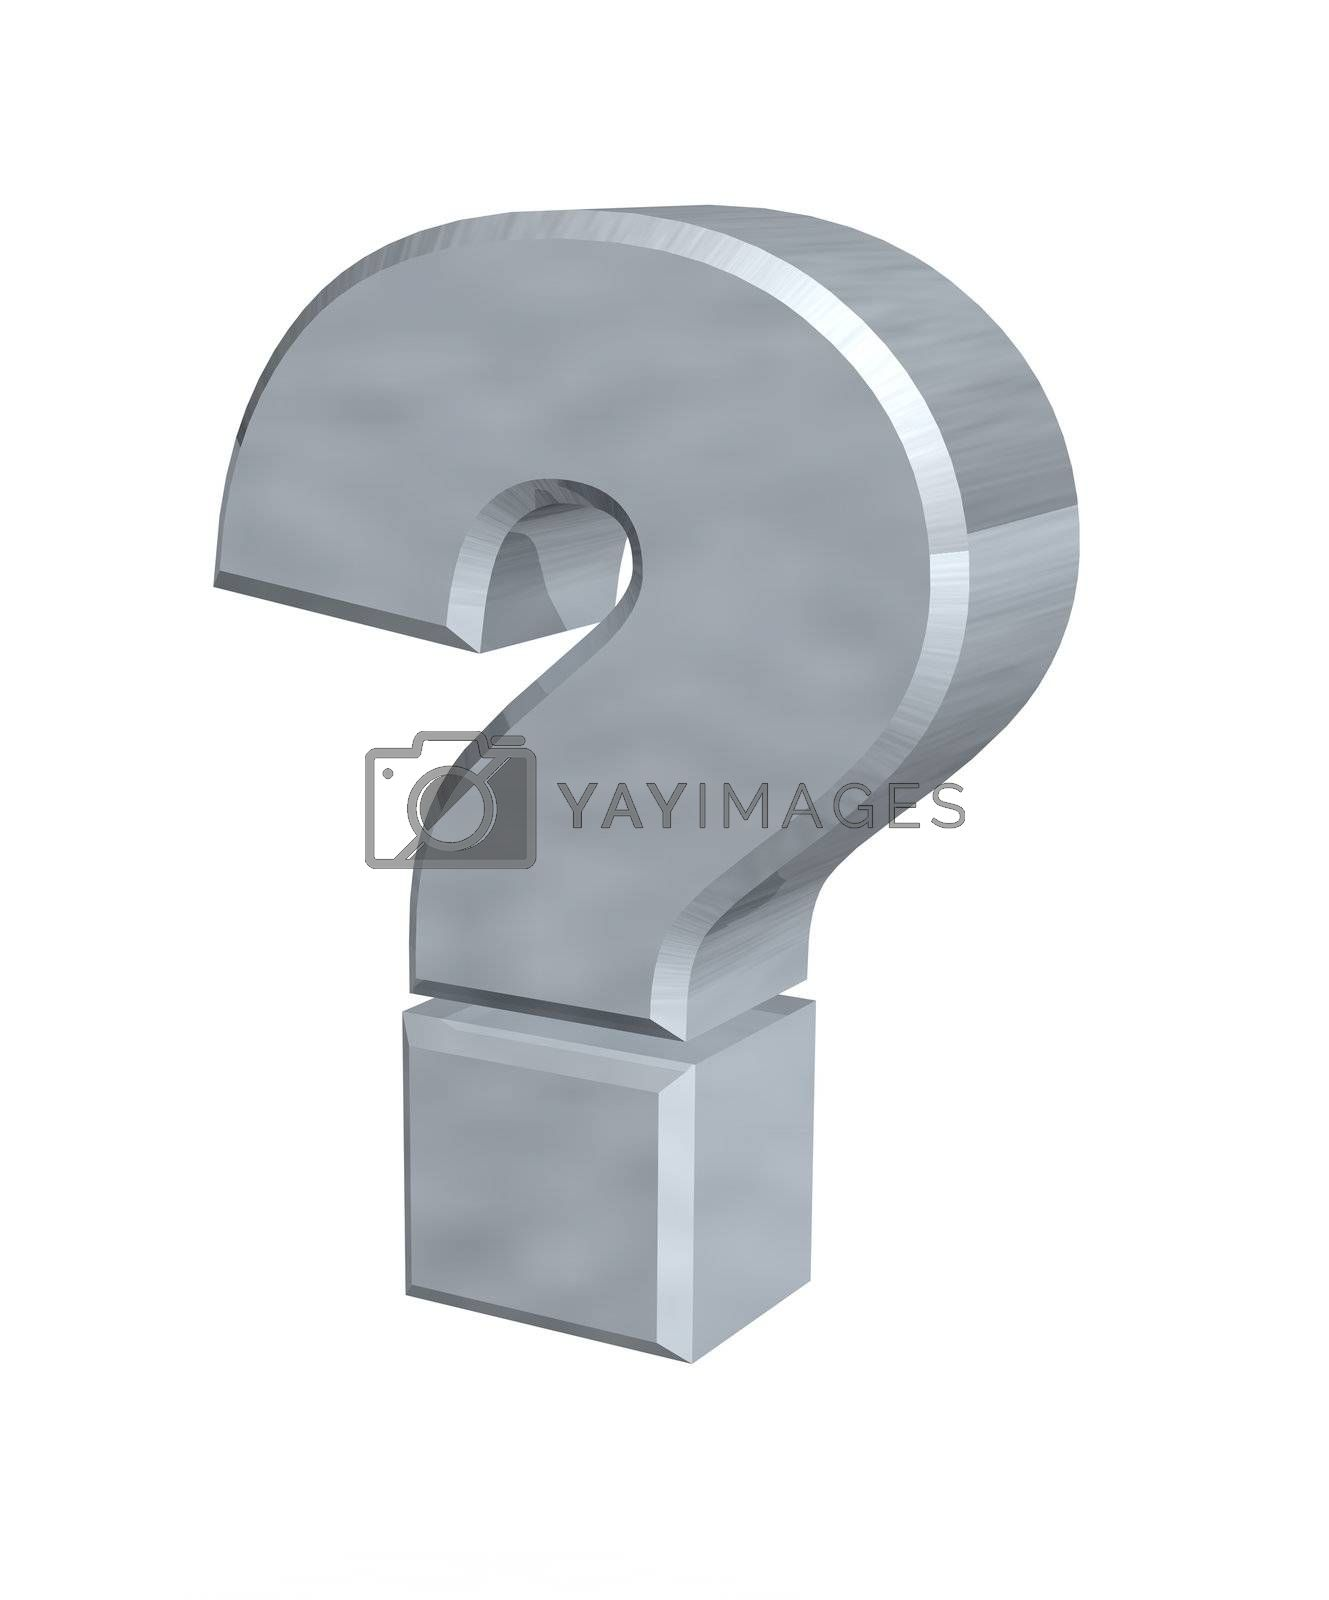 metal question mark  - 3d illustration